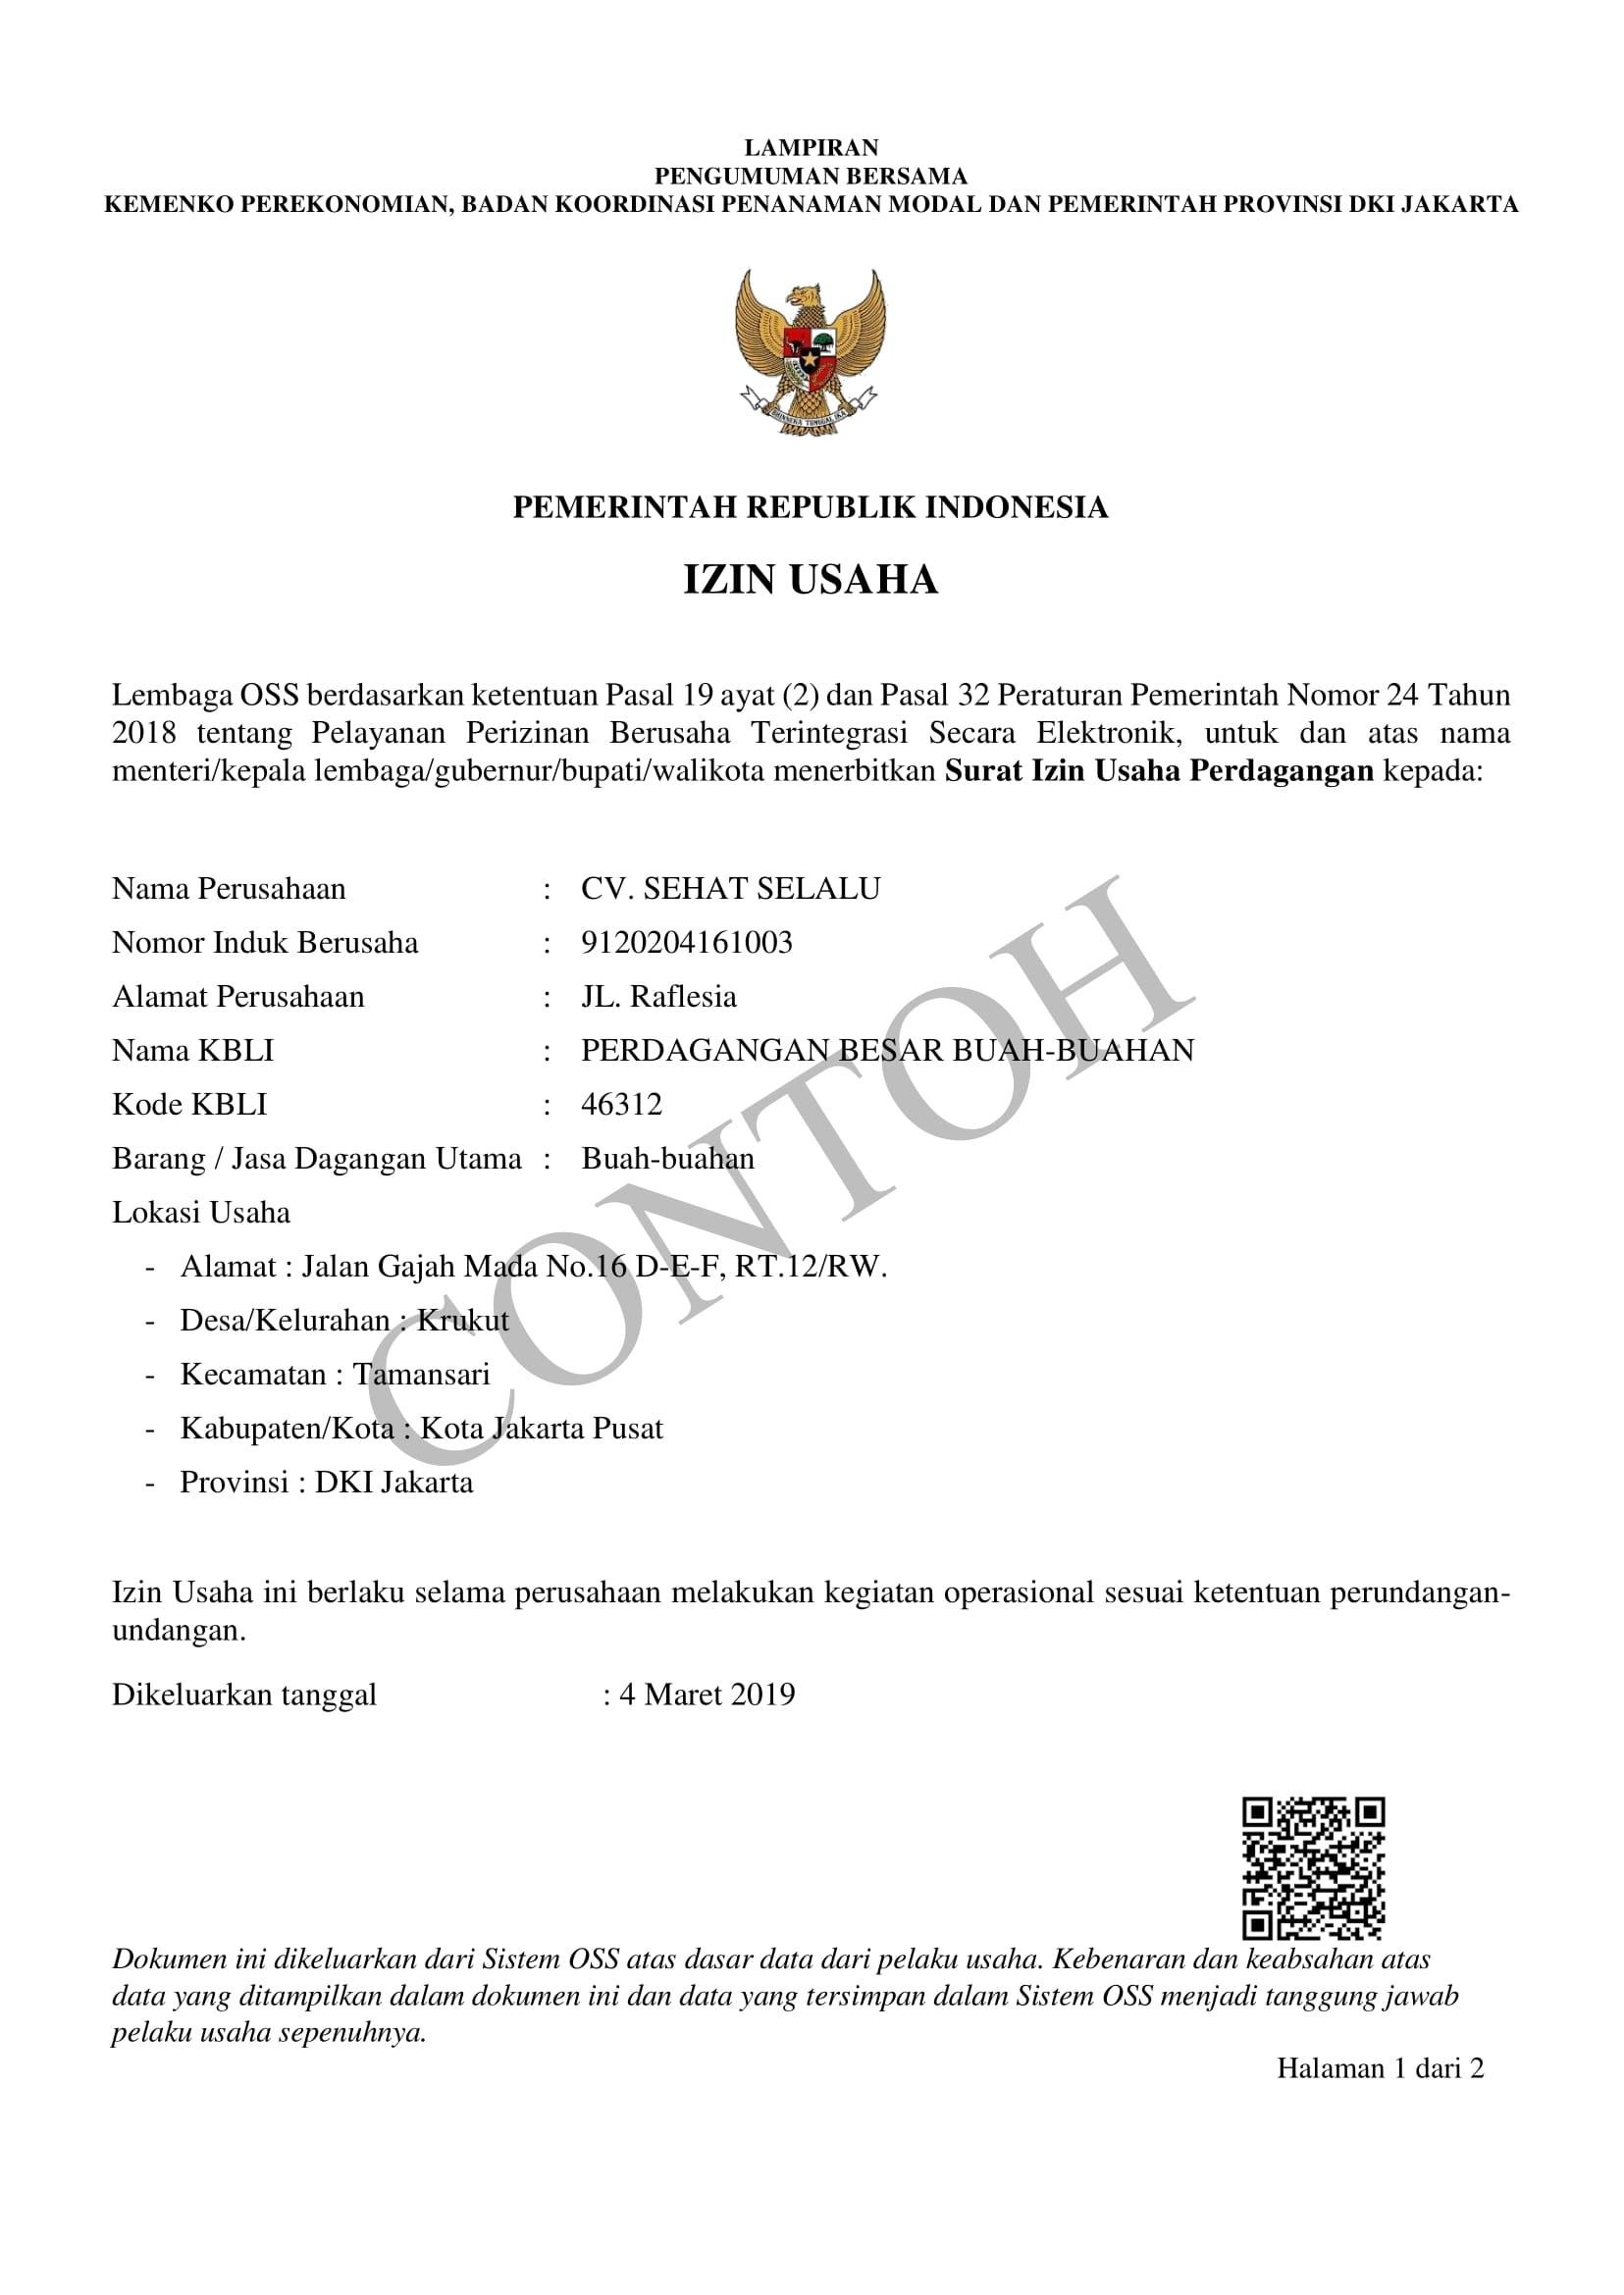 Contoh Surat Izin Usaha Perdagangan Dari Kelurahan